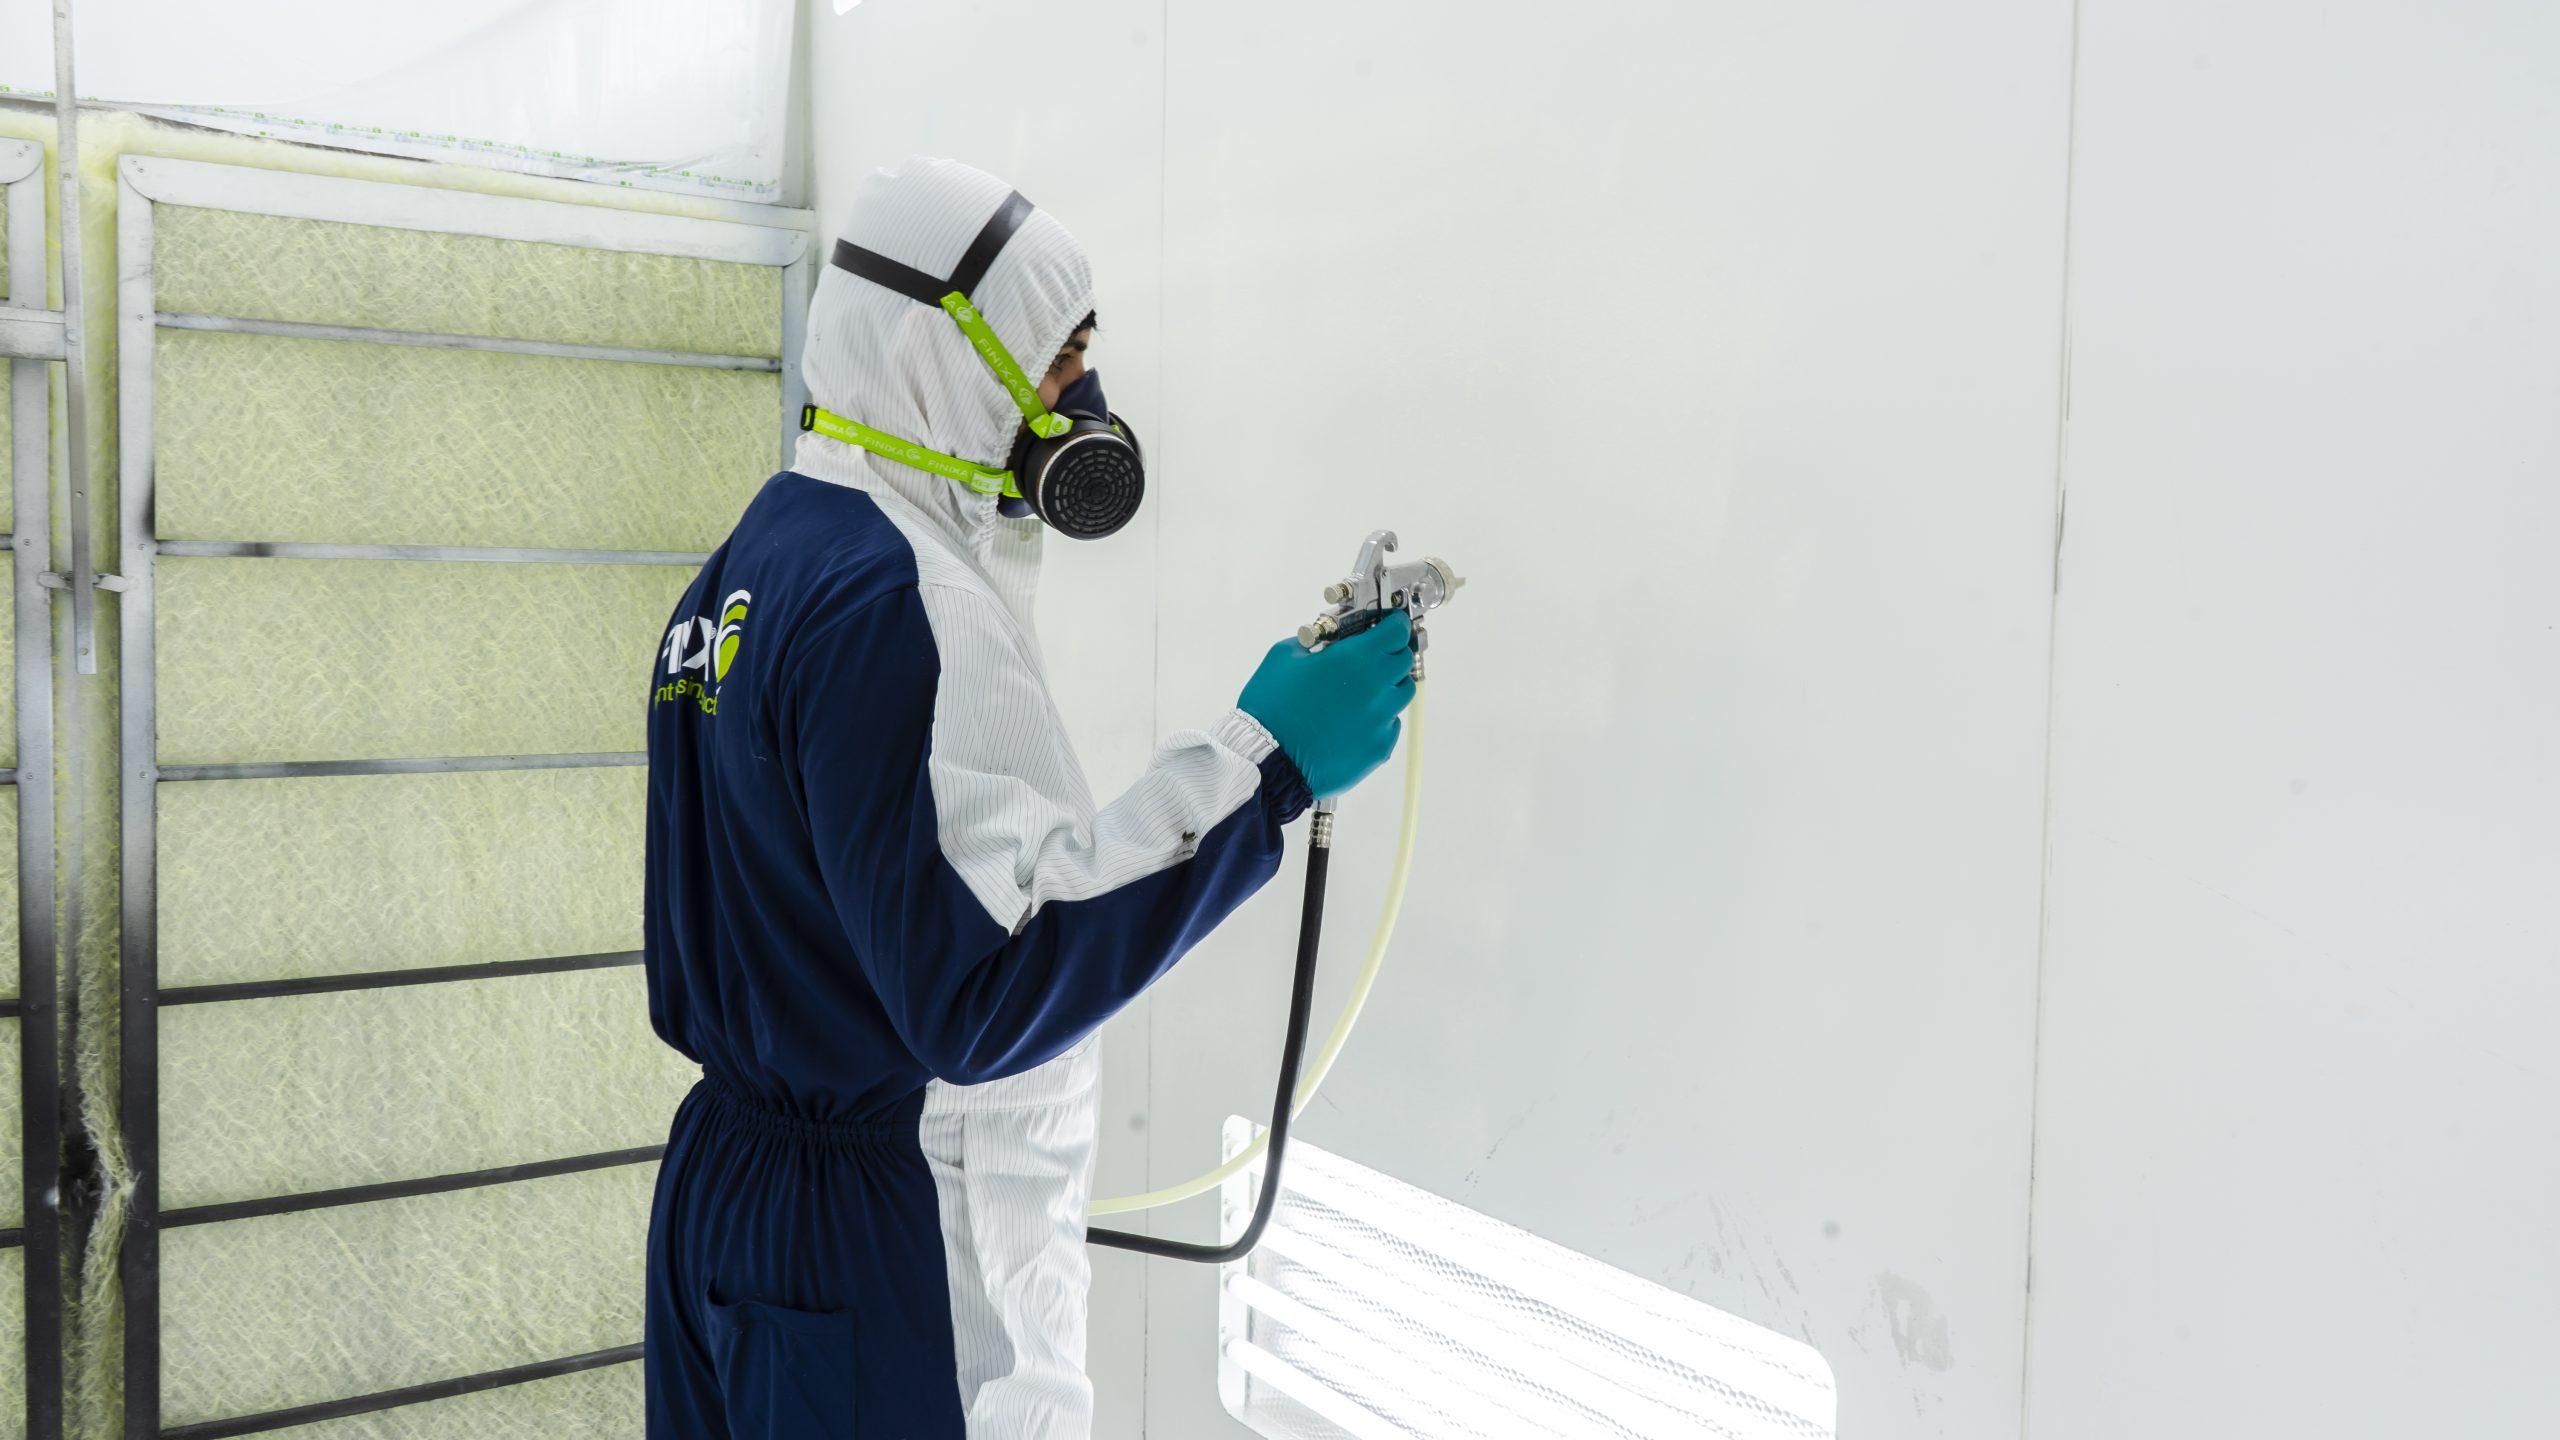 Peelable Spray Booth Protect